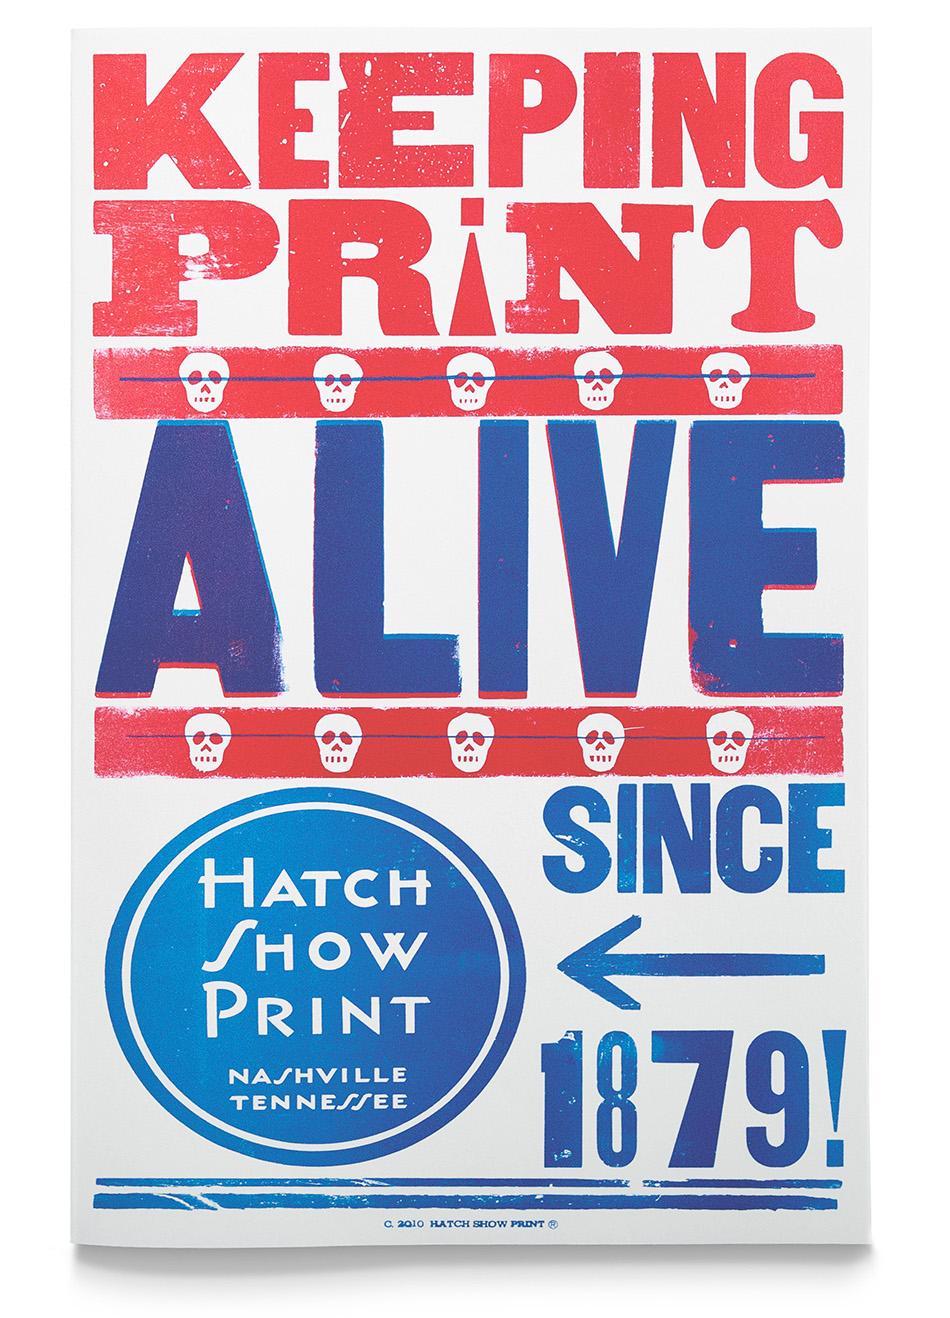 Hatch_Show_Print_Keeping_Print_alive.jpg